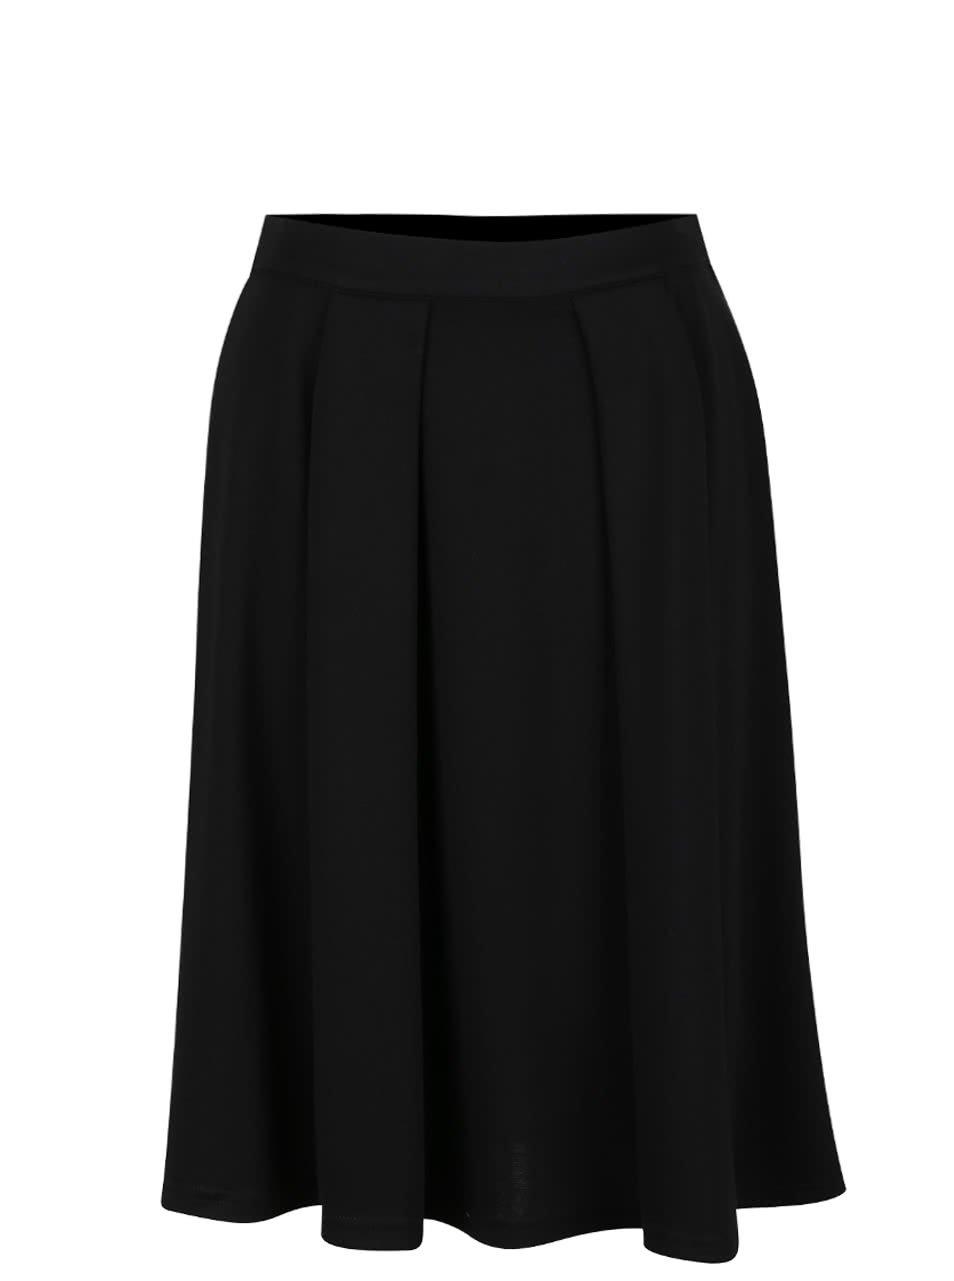 Černá skládaná sukně VILA Skate